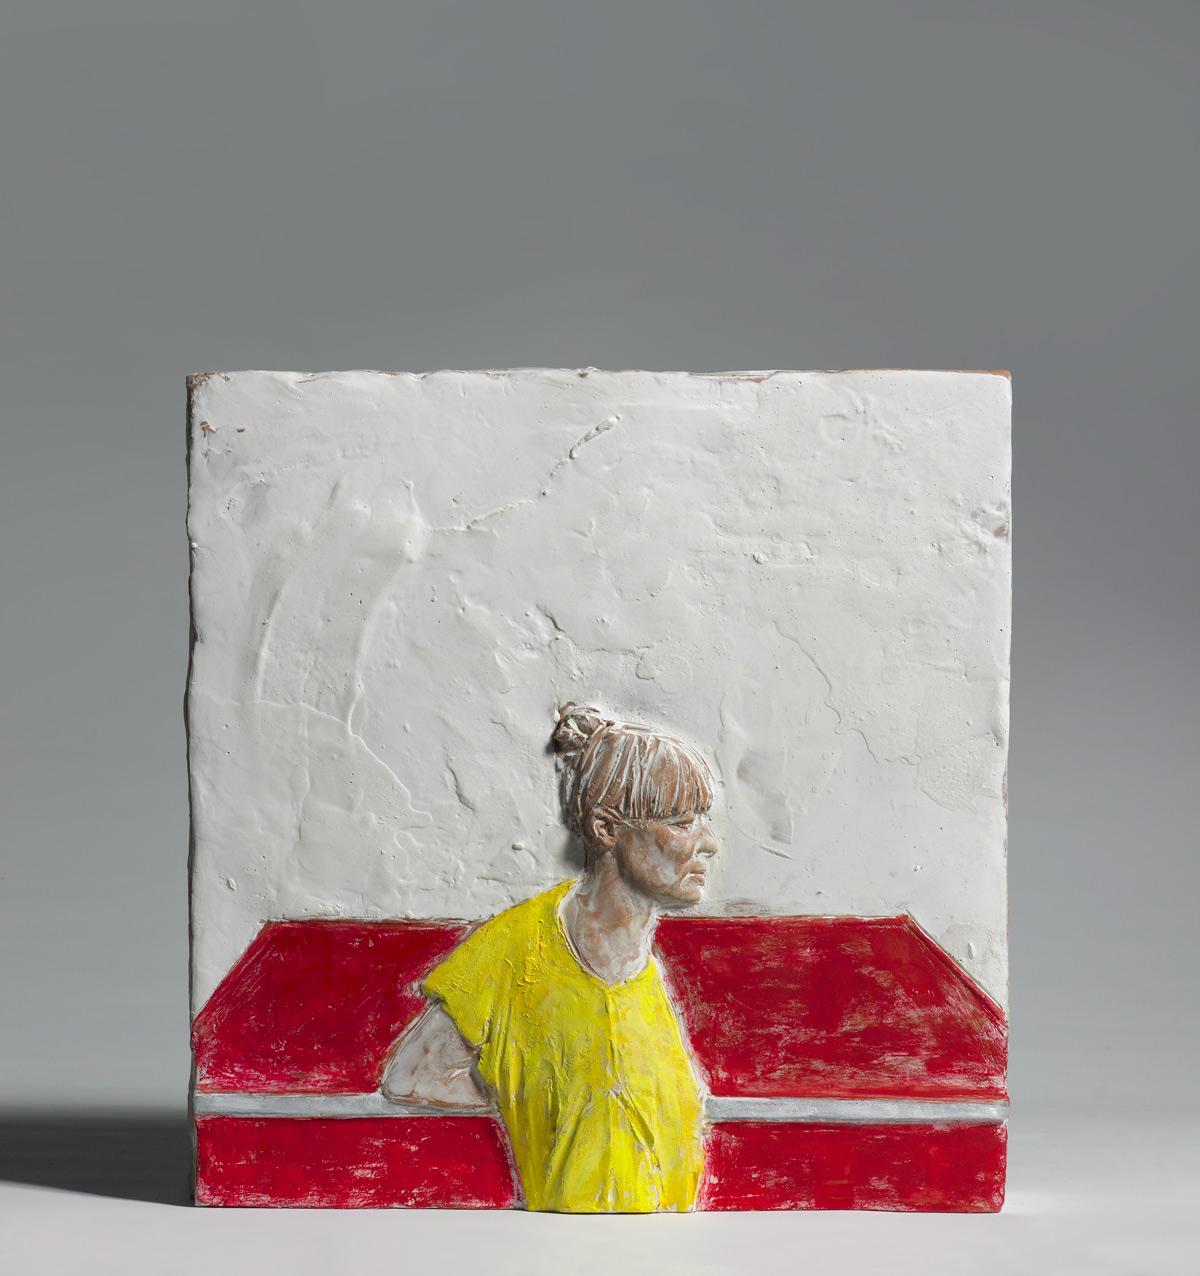 Giuseppe-Bergomi-8-etra-studio-tommasi